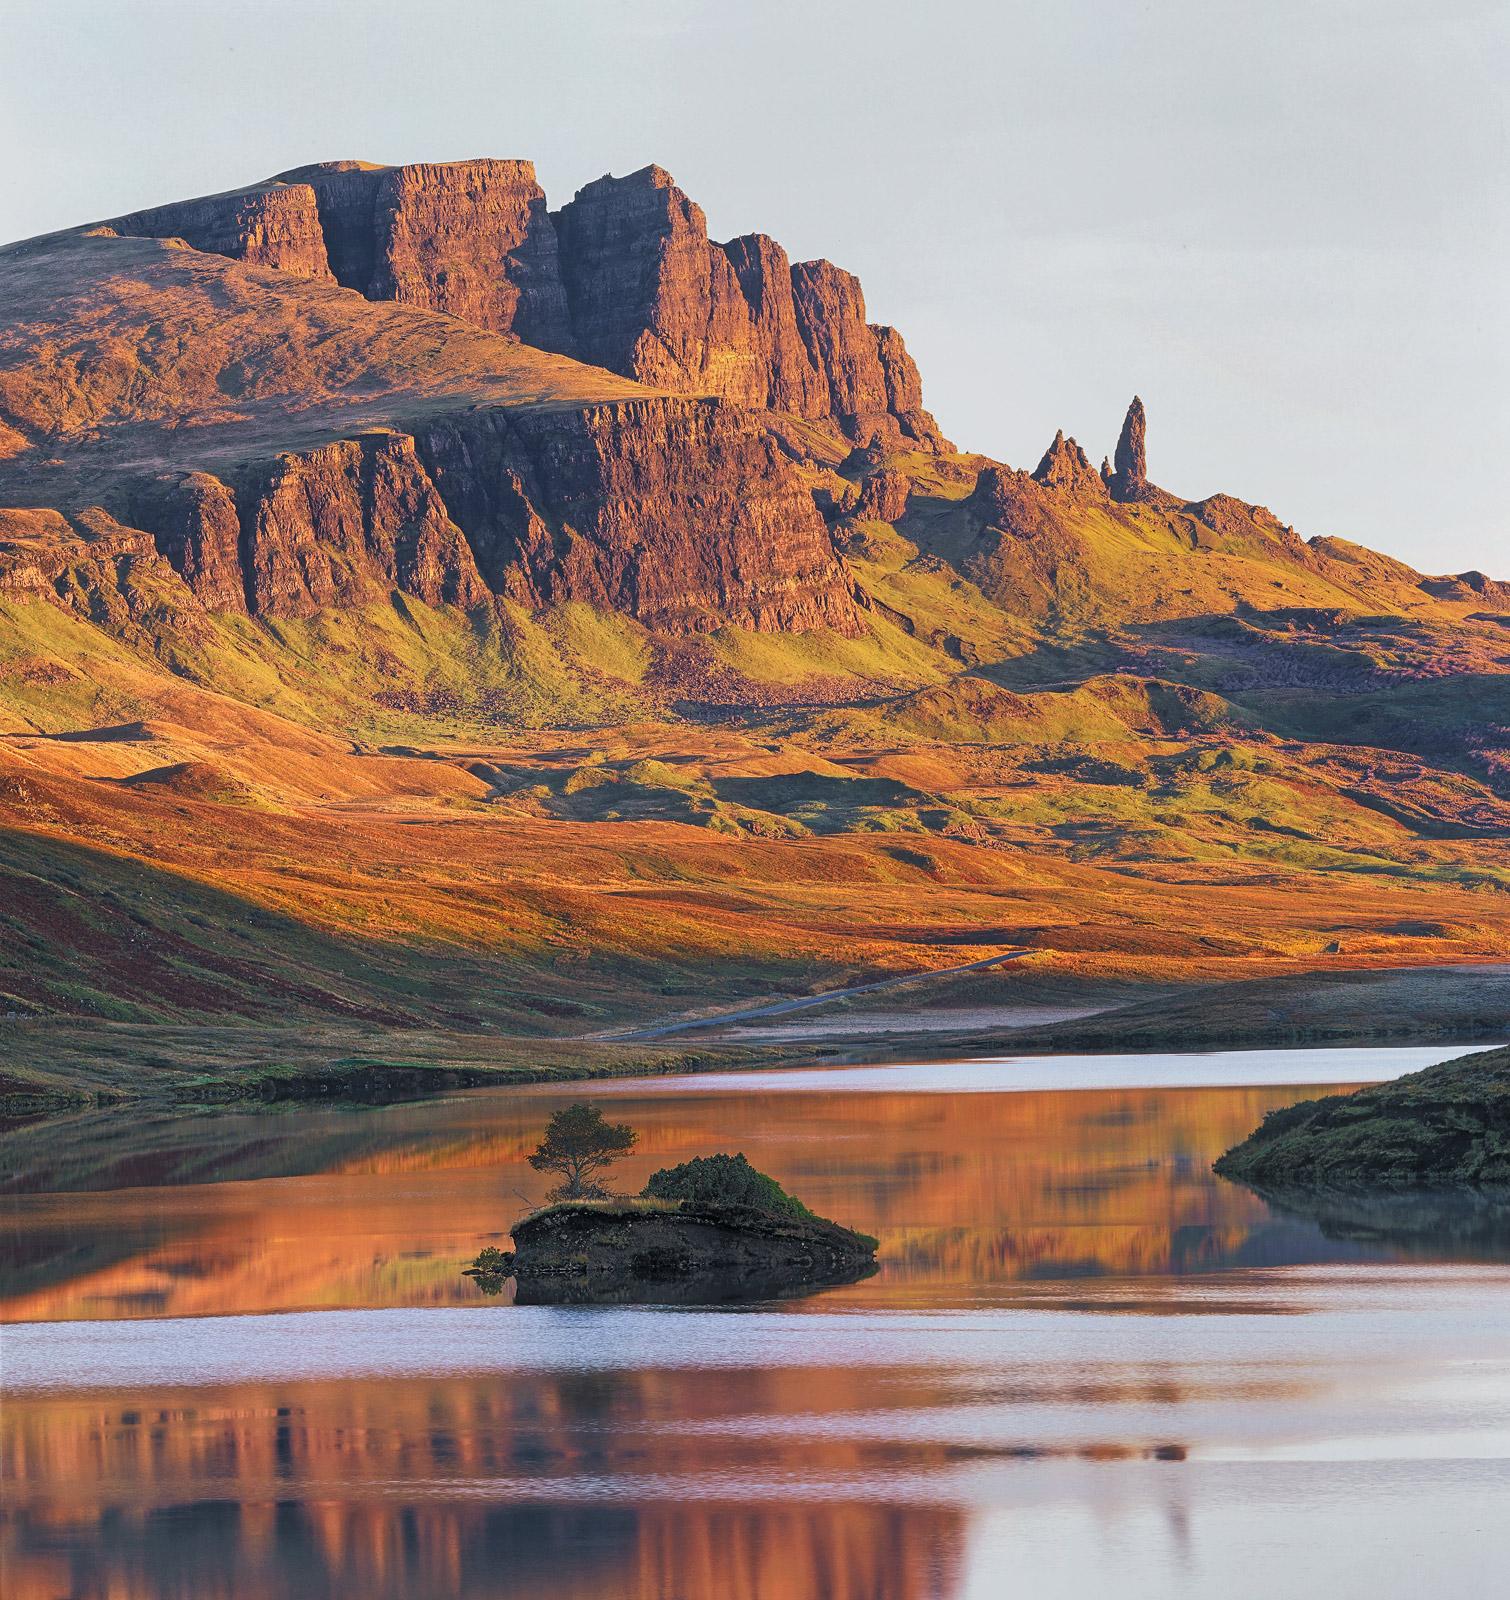 Sunrise Loch Fada, Loch Fada, Skye, Scotland, escarpment, Old Man of Storr, reflection, sunrise, colour, amber, cliffs, , photo